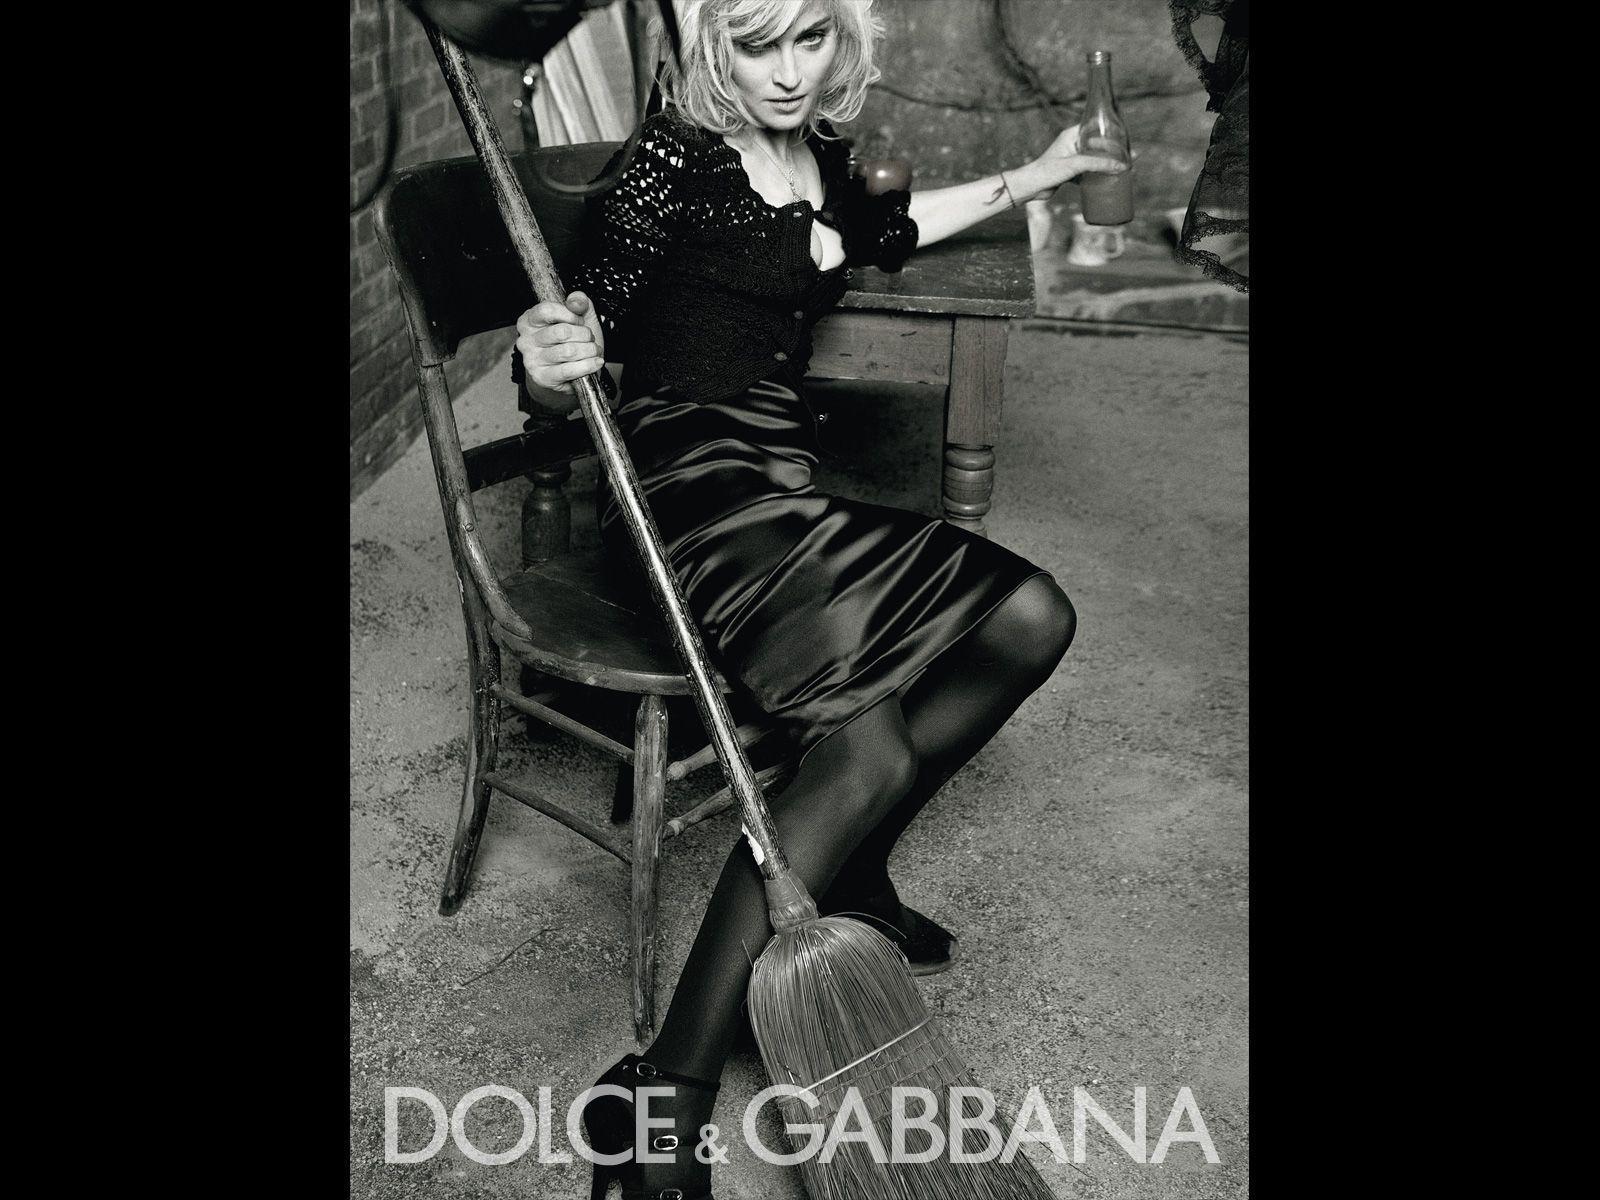 Dolce Gabbana Promo Gabbana Promo Pictures